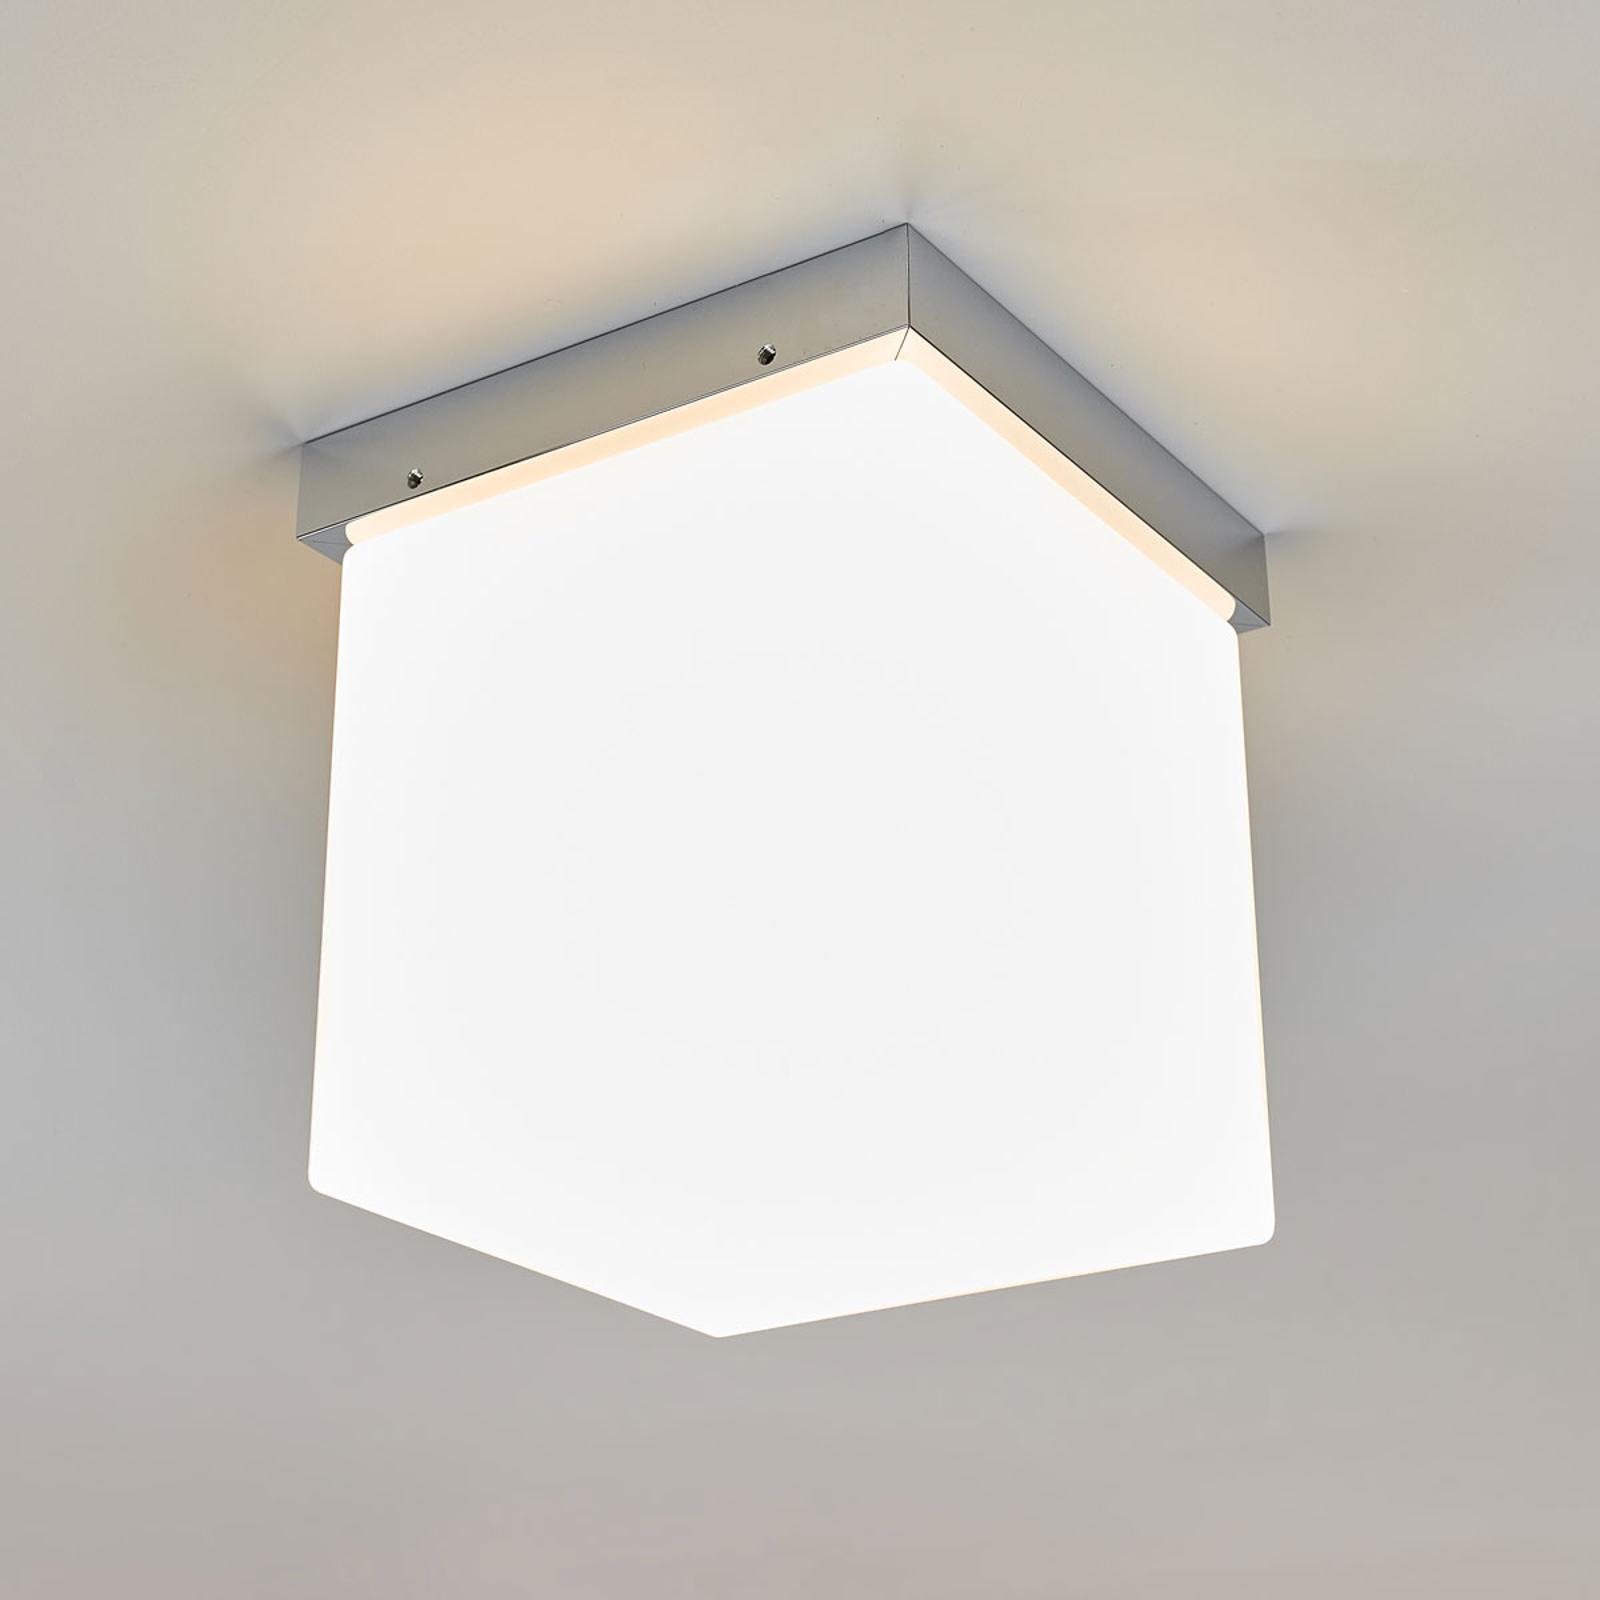 Glashütte Limburg Kaleo - LED-Deckenleuchte IP44